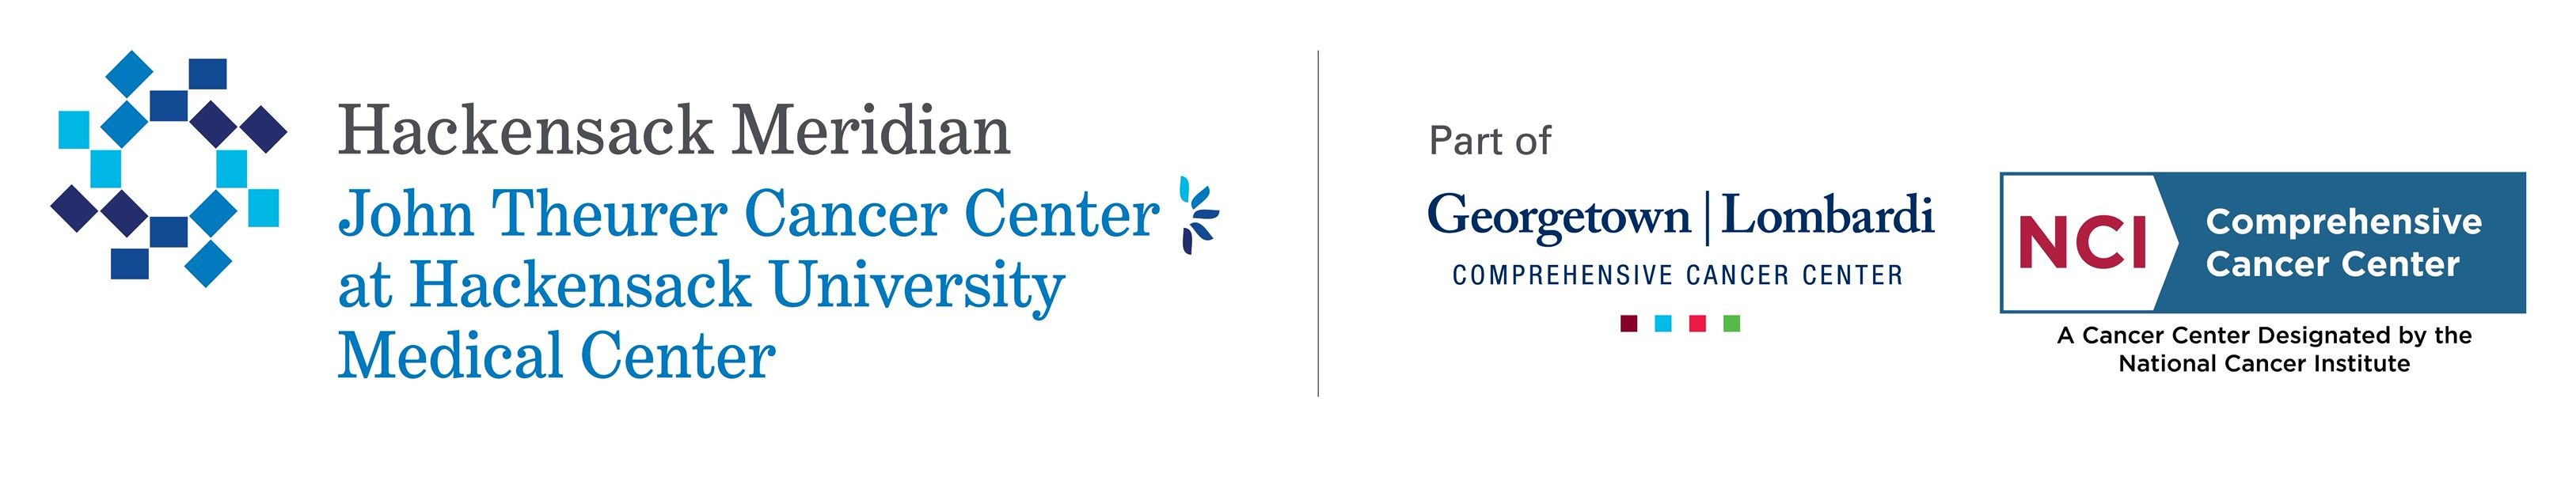 Partner | Cancer Centers | <b>John Theurer Cancer Center</b>